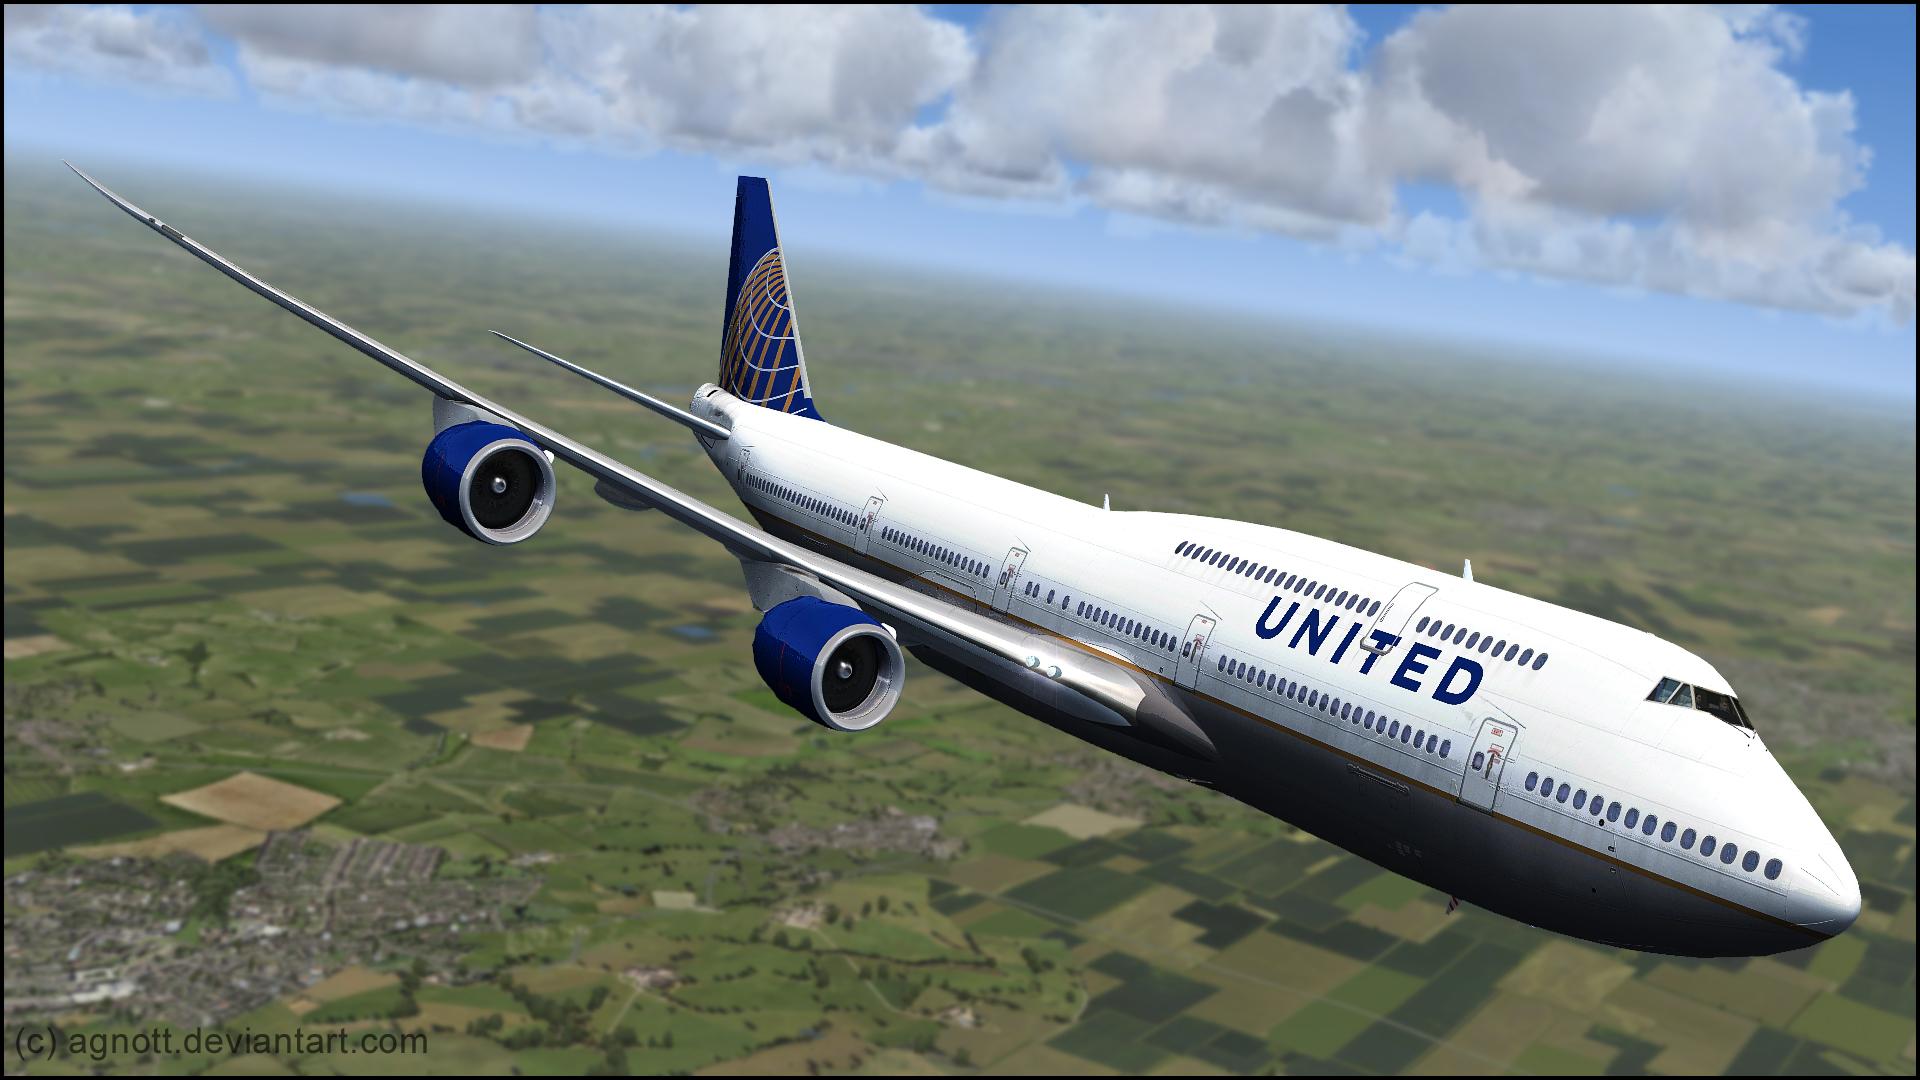 7478i United Airlines By Agnott On Deviantart Sugar Skull Car Seat Covers Goal Bar